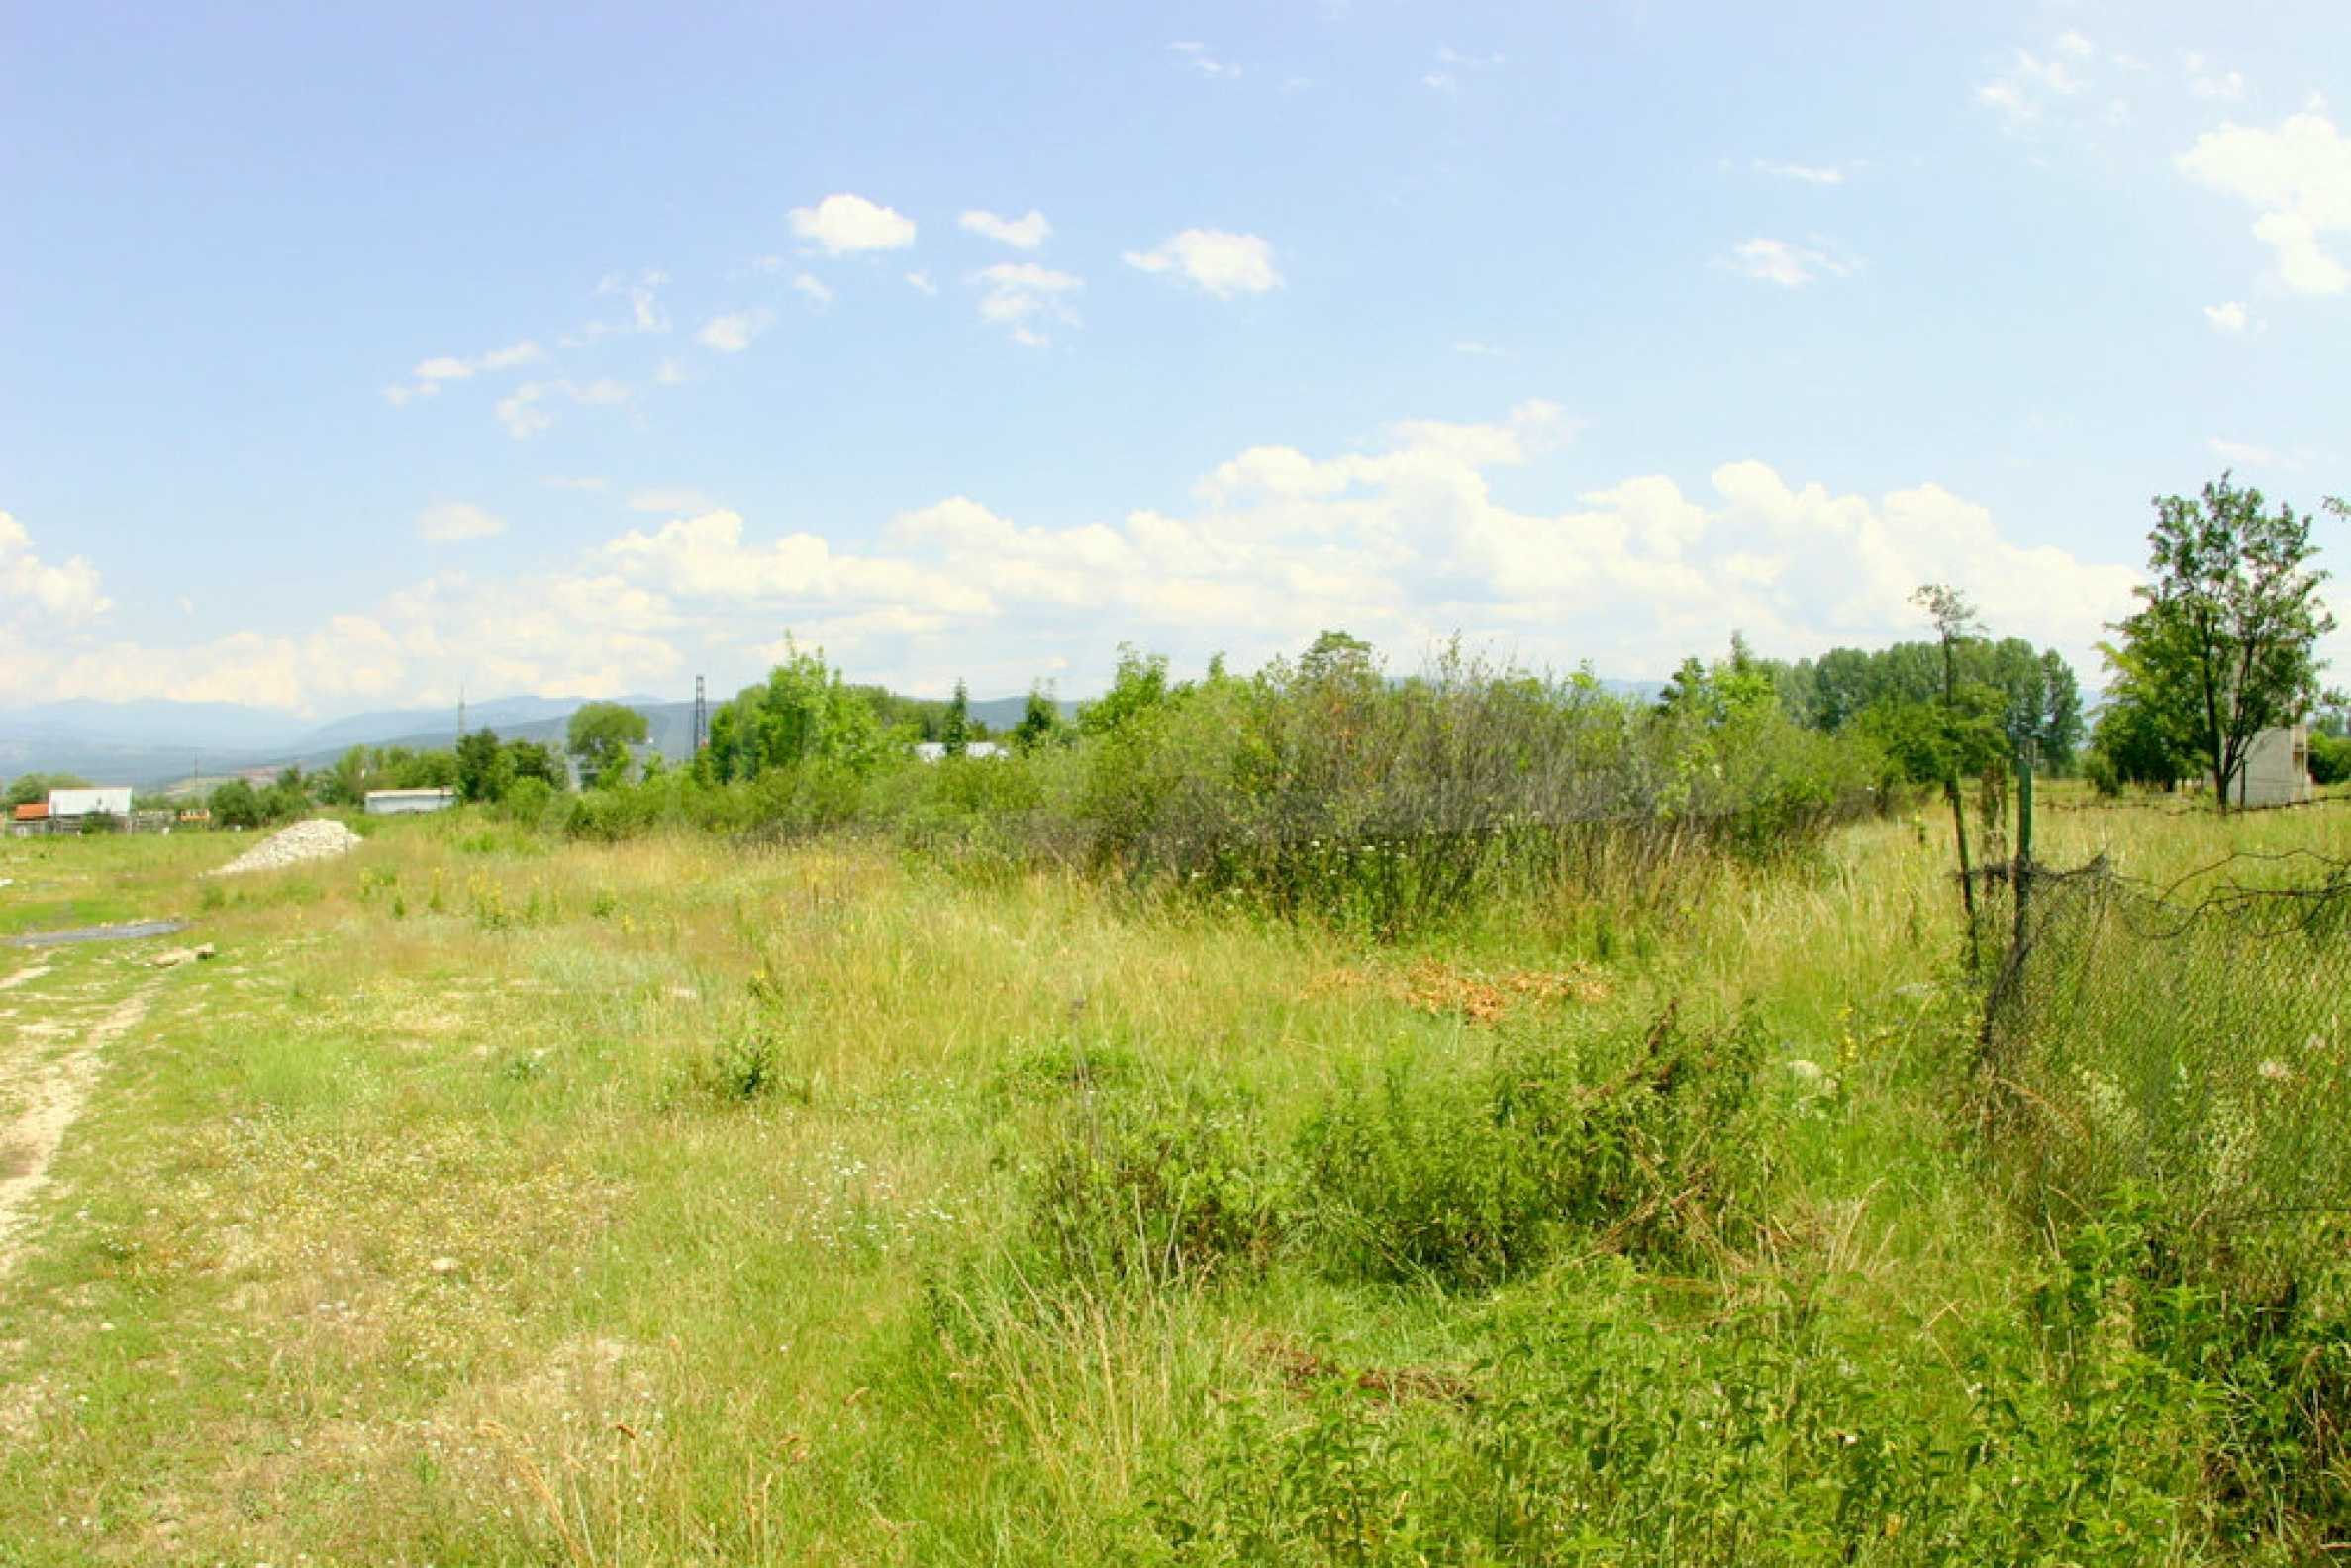 Agricultural land near the ski resort of Bansko